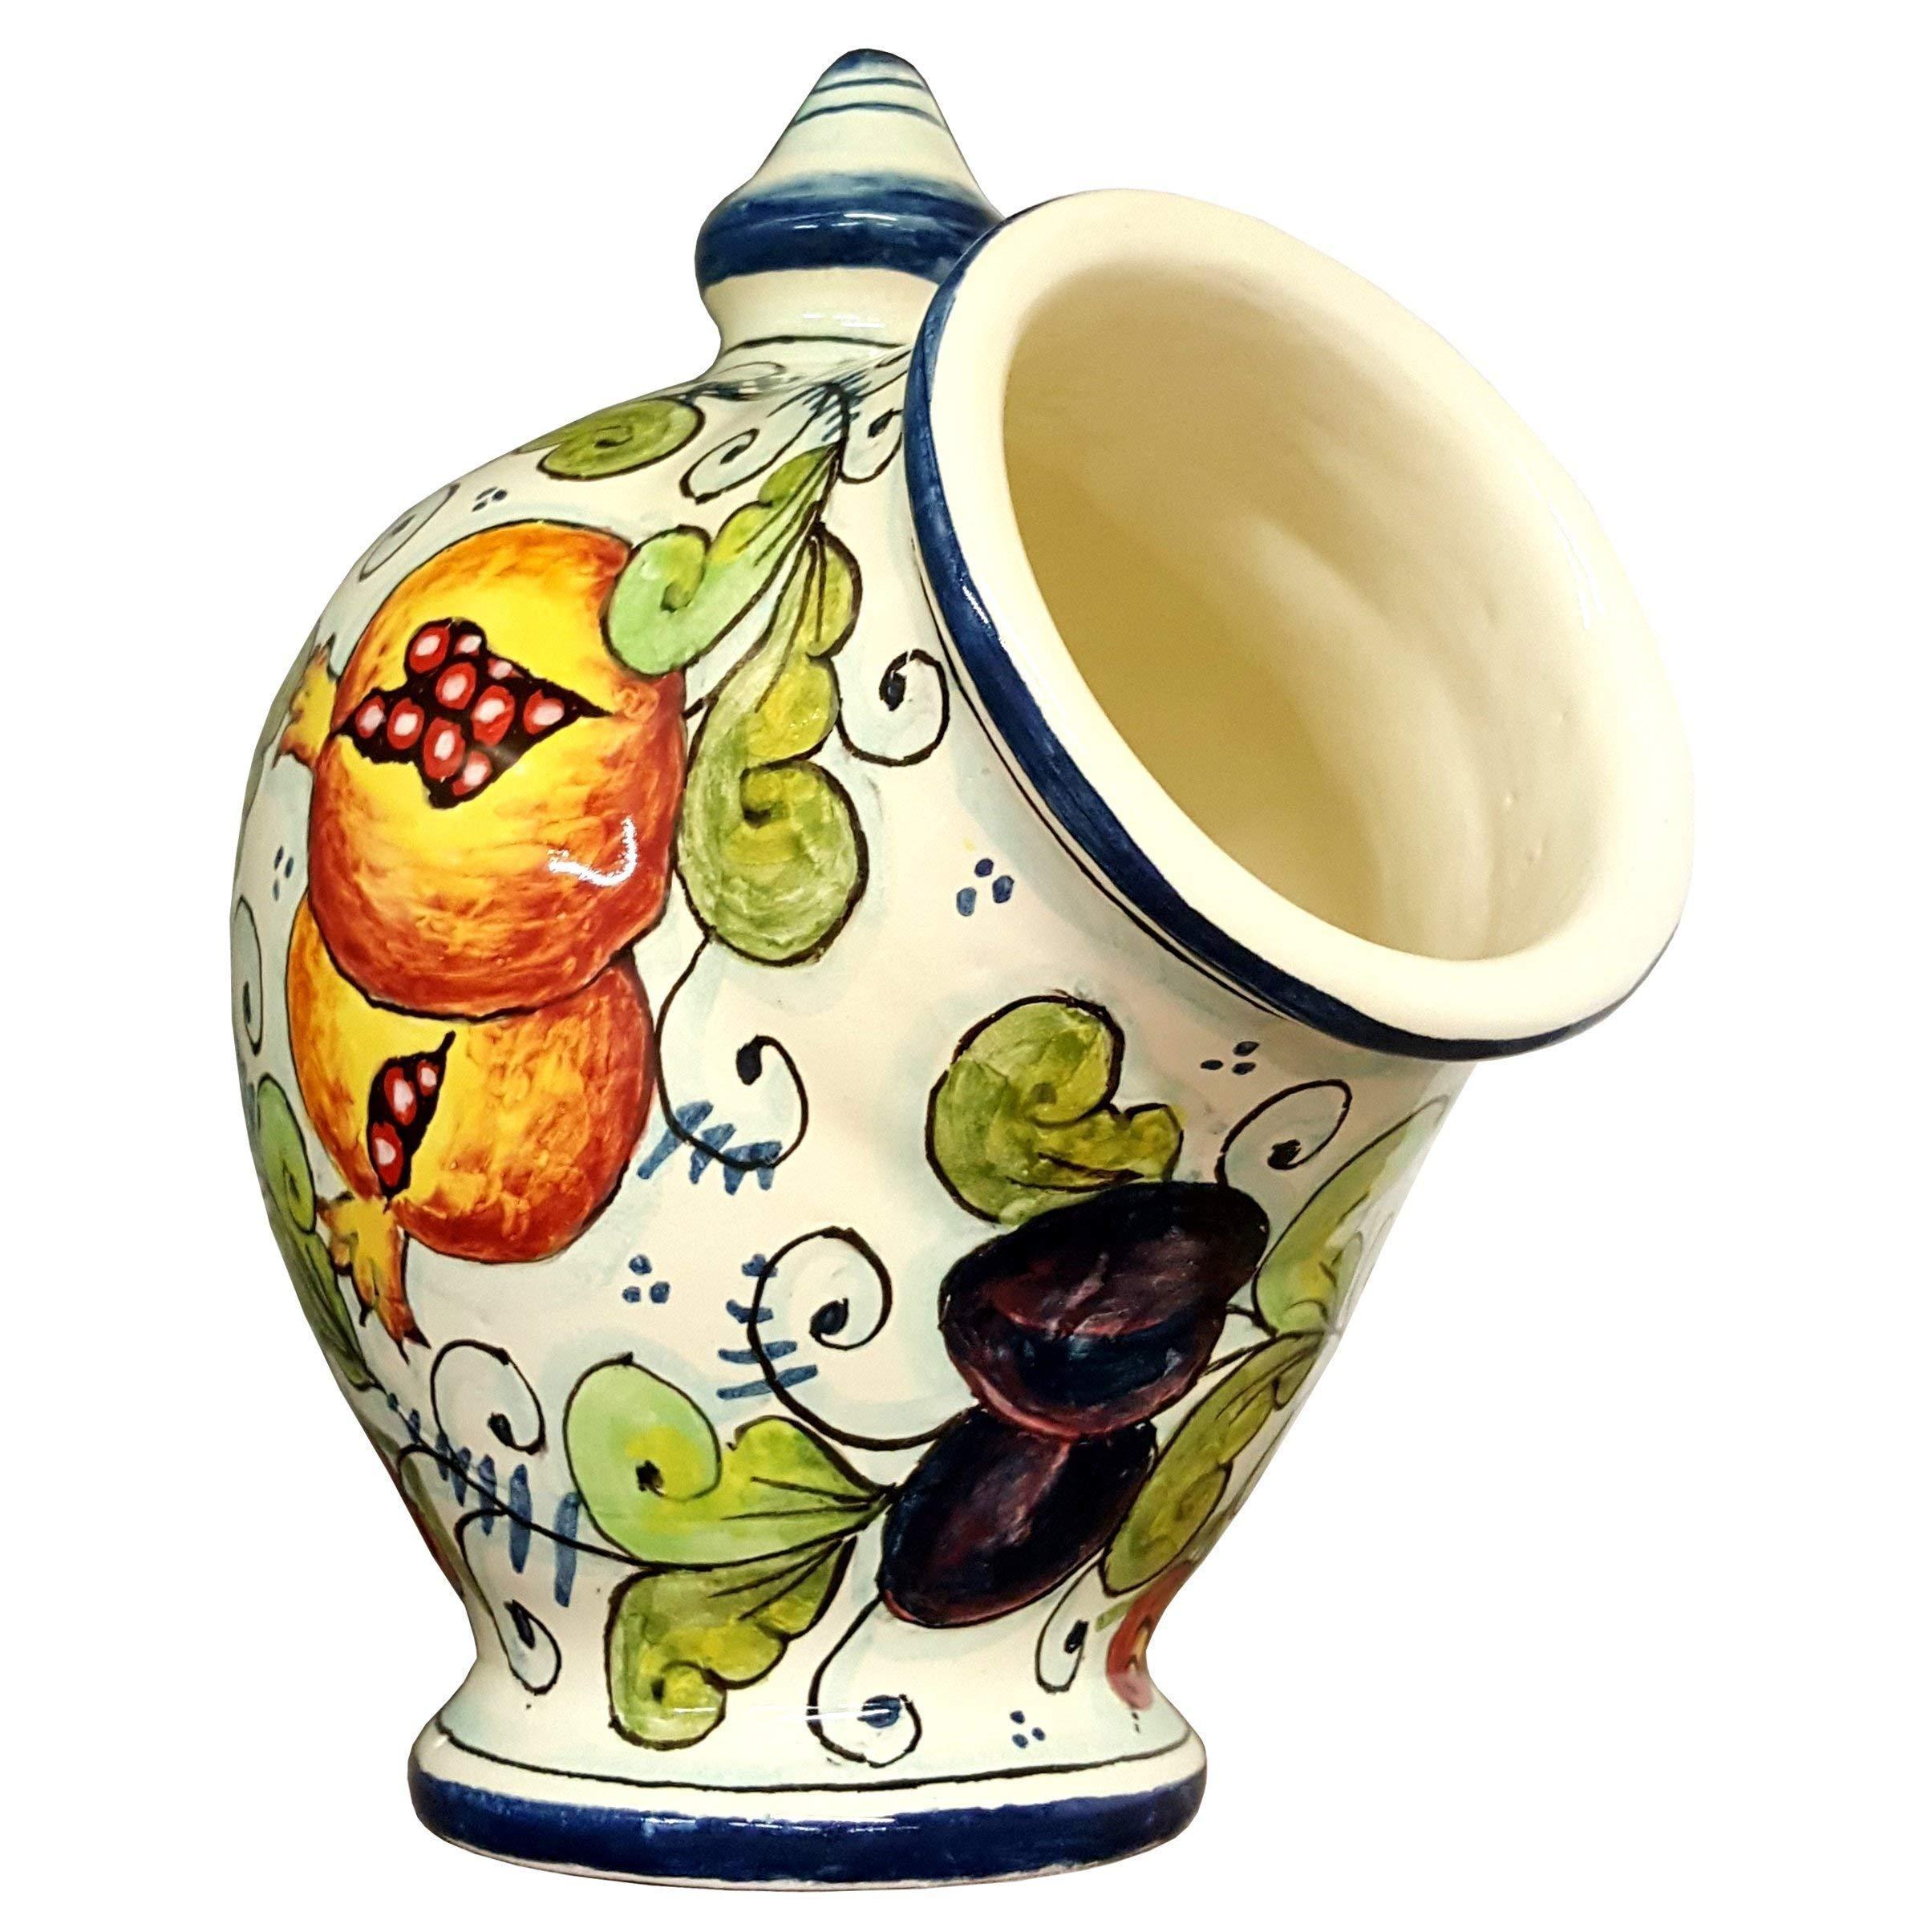 CERAMICHE D'ARTE PARRINI- Italian Ceramic Jar Salt Holder Sponge Hand Painted Decorated Fruit Made in ITALY Tuscan Art Pottery by CERAMICHE D'ARTE PARRINI since 1979 (Image #2)